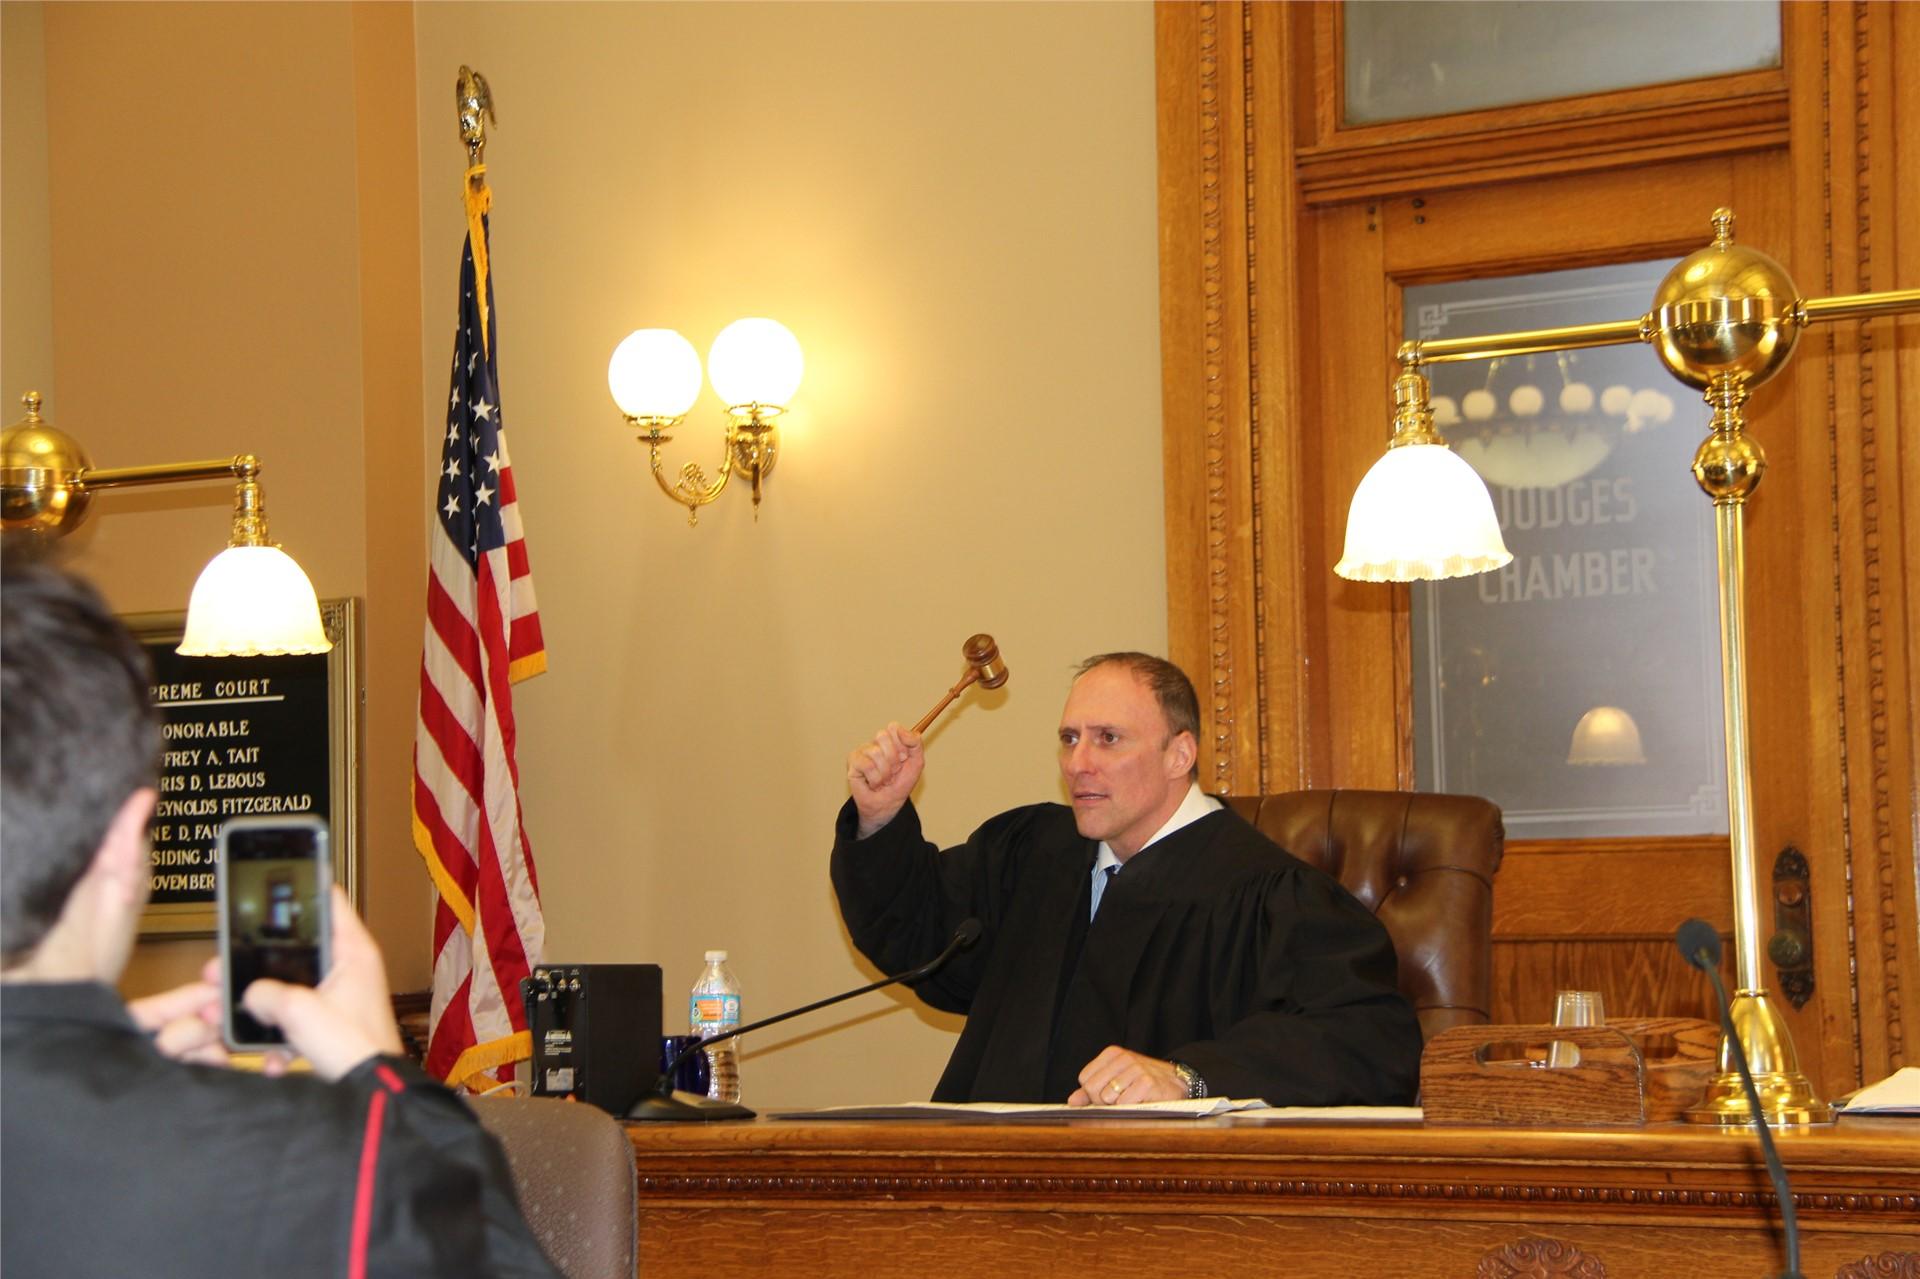 teacher sitting at judges chair holding gavel